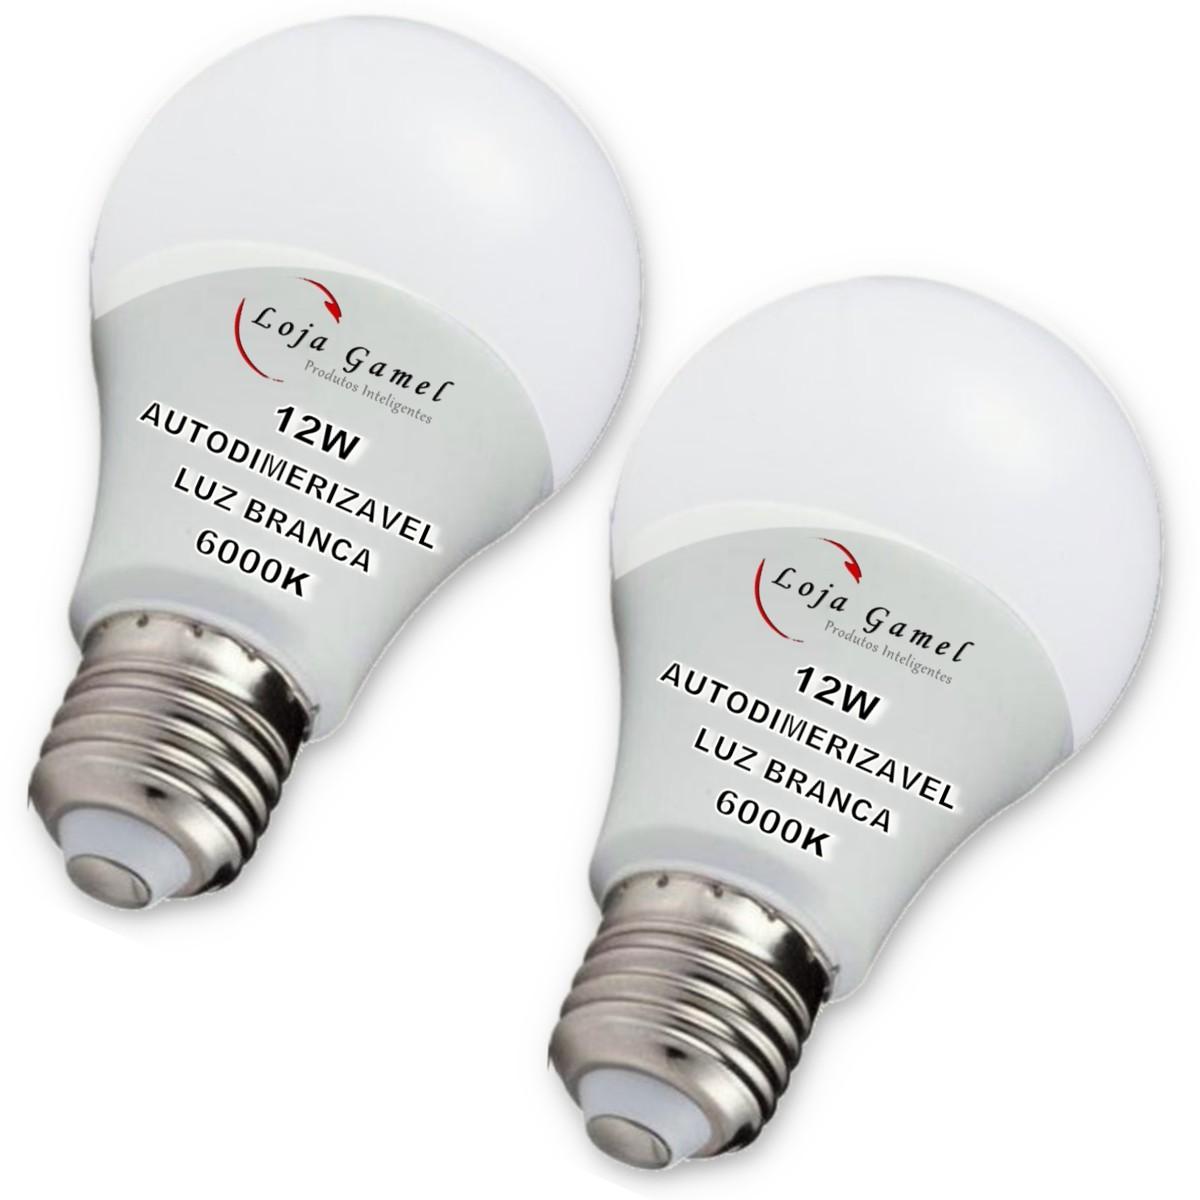 Foto 1 - Lâmpada LED Bulbo Autodimerizável 12W Luz Branca 6000K Kit 2un